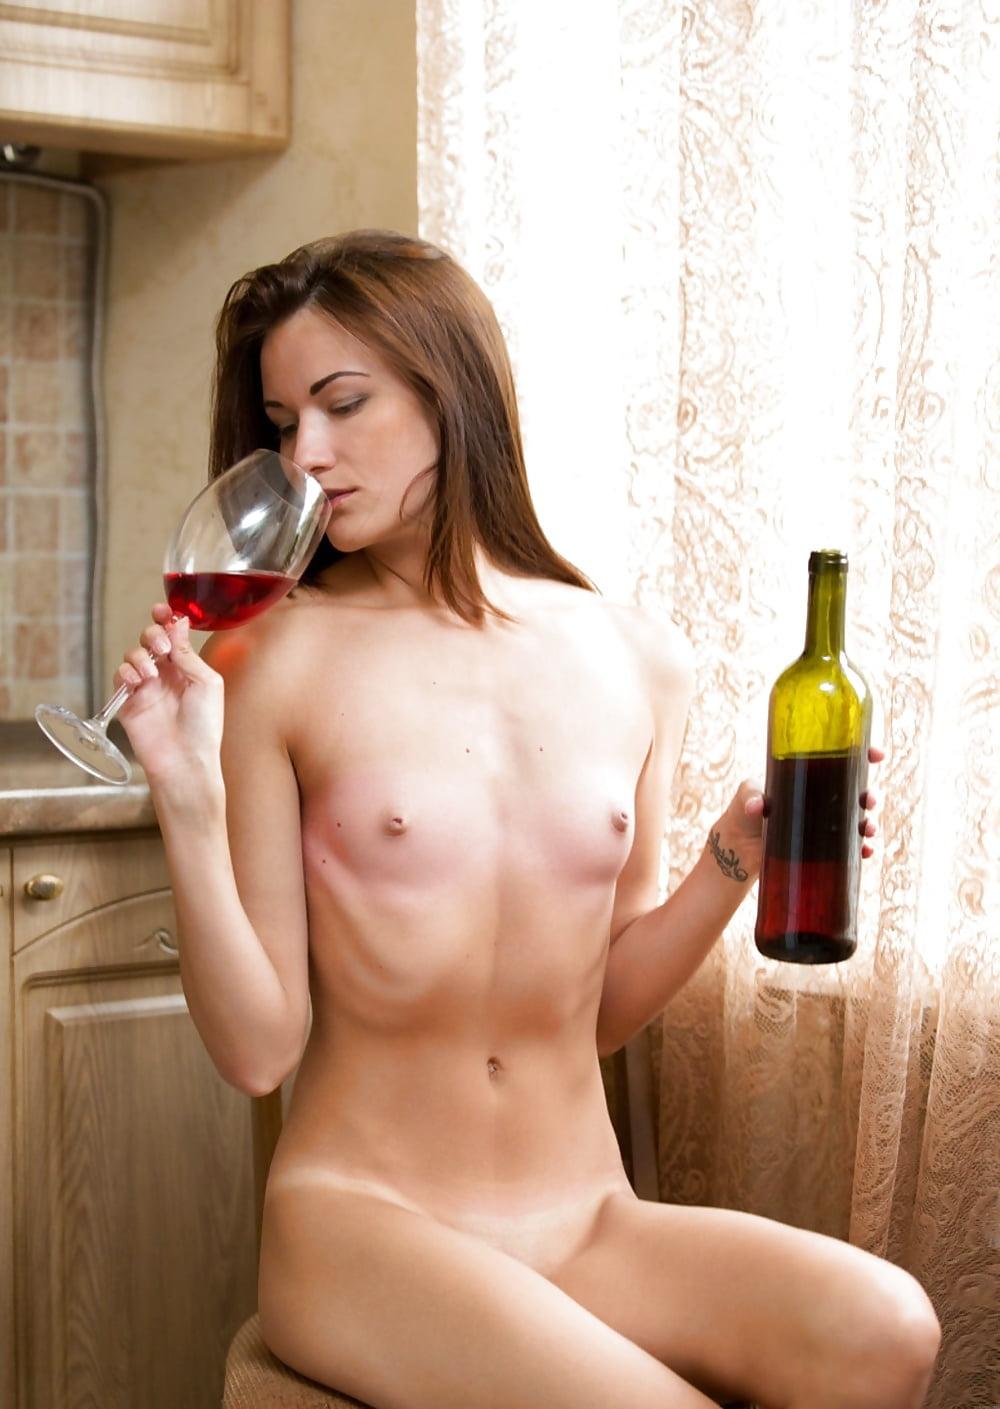 nudes-drink